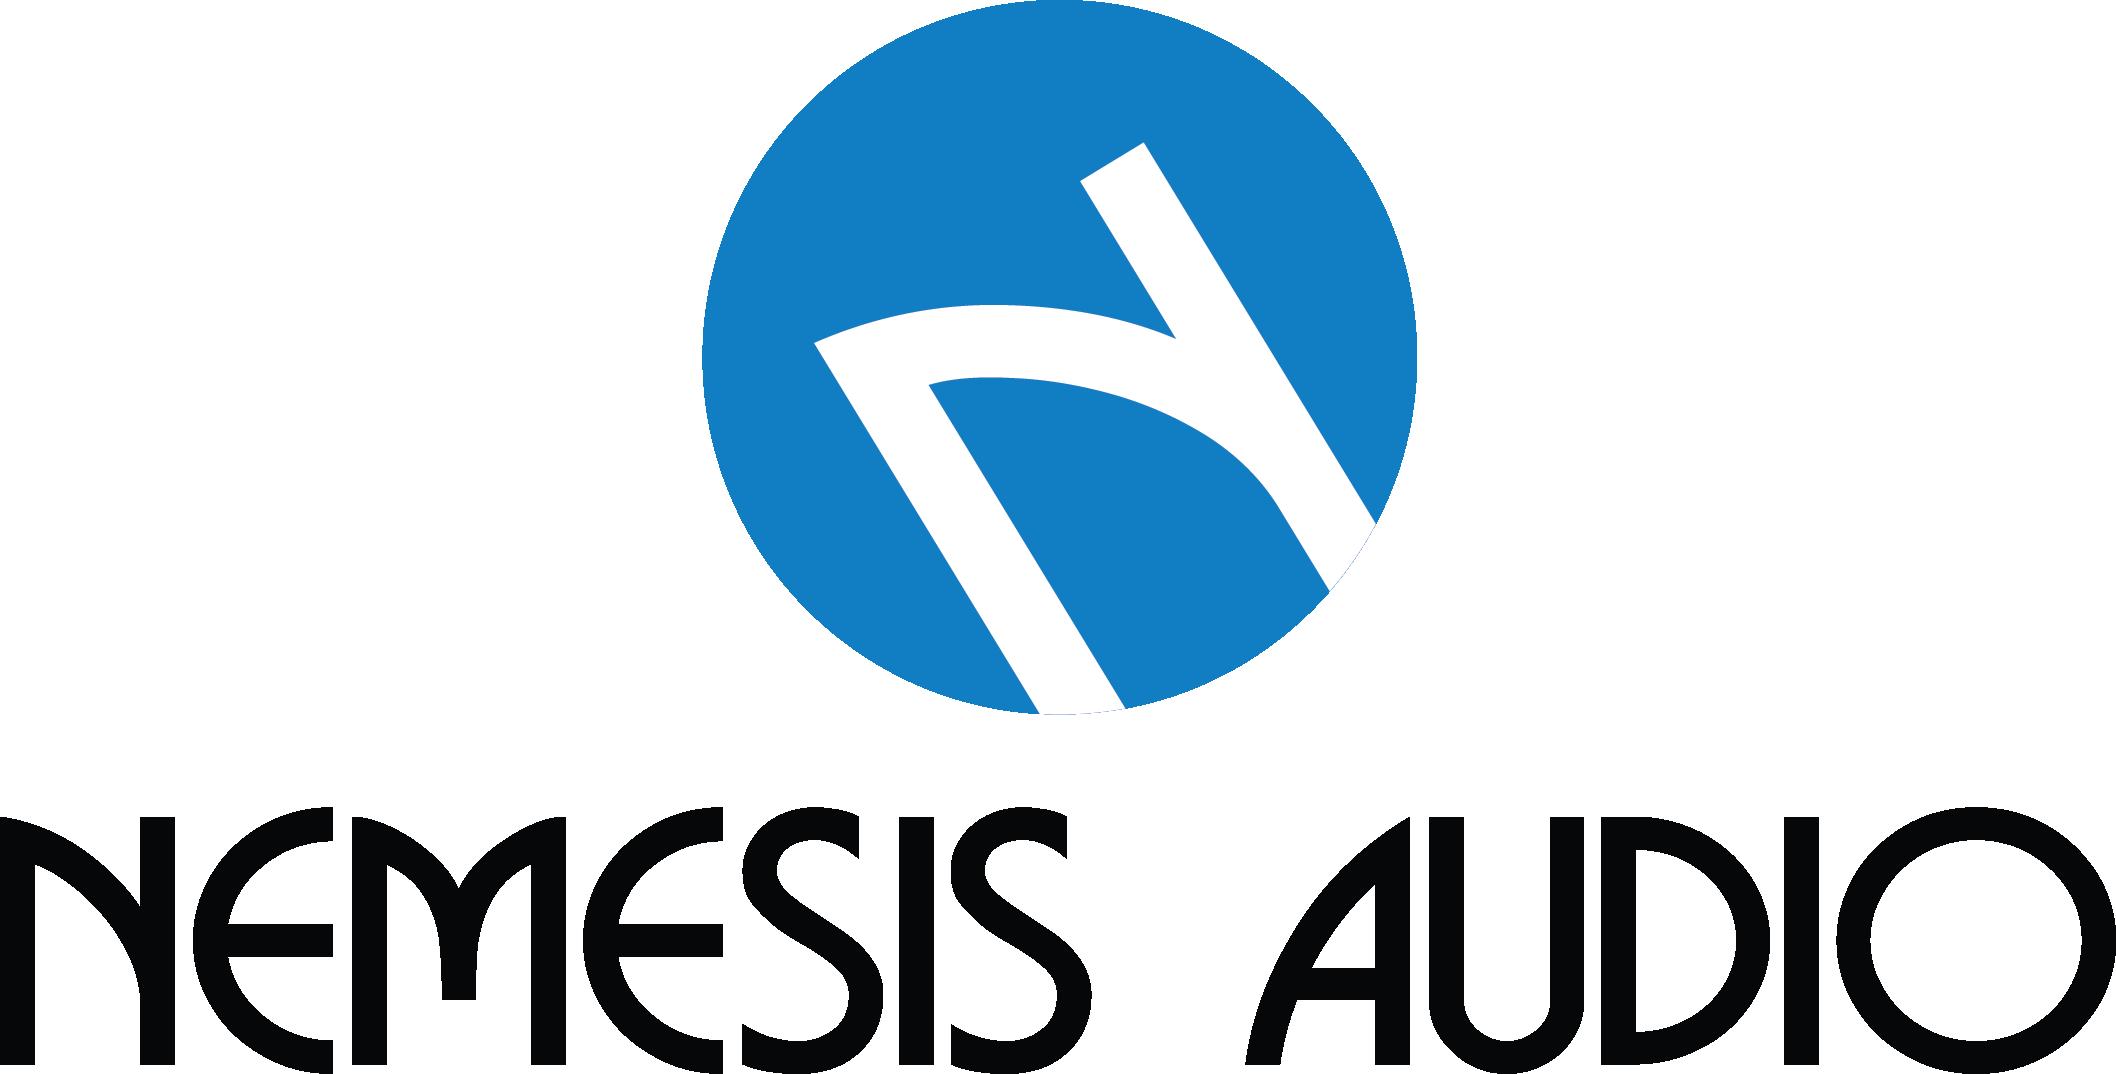 NEMESIS AUDIO logo fianl file 20619